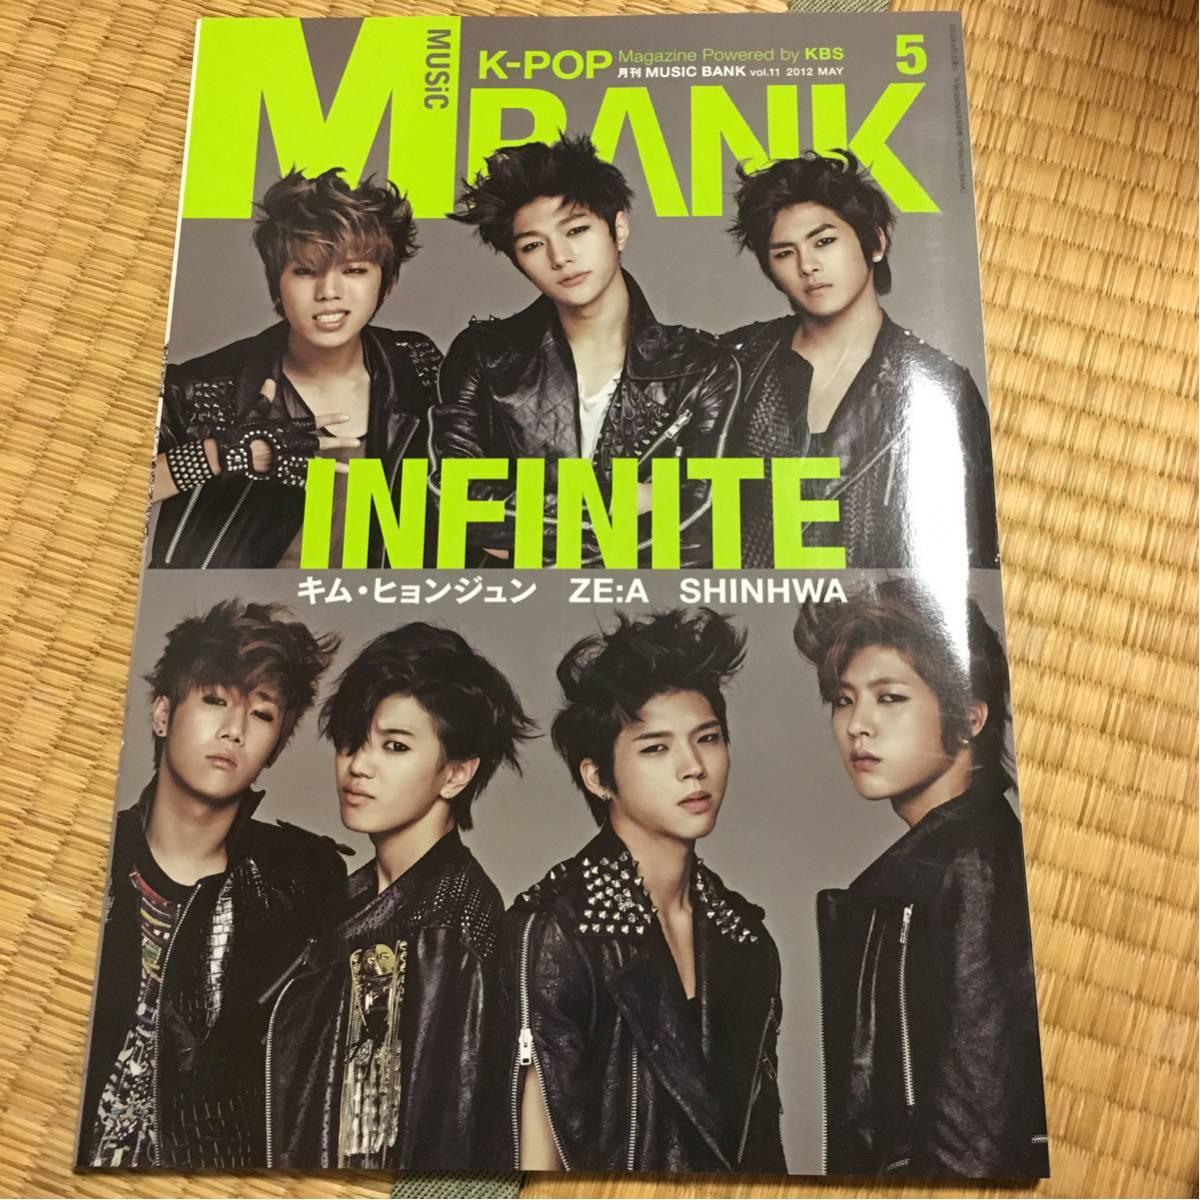 [ K-POP MUSIC BANK ] vol.11 2012 5月号 INFINITE ソンギュ ウヒョン ドンウ ホヤ ソンヨル エル ソンジョン キム・ヒョンジュン ZE:A